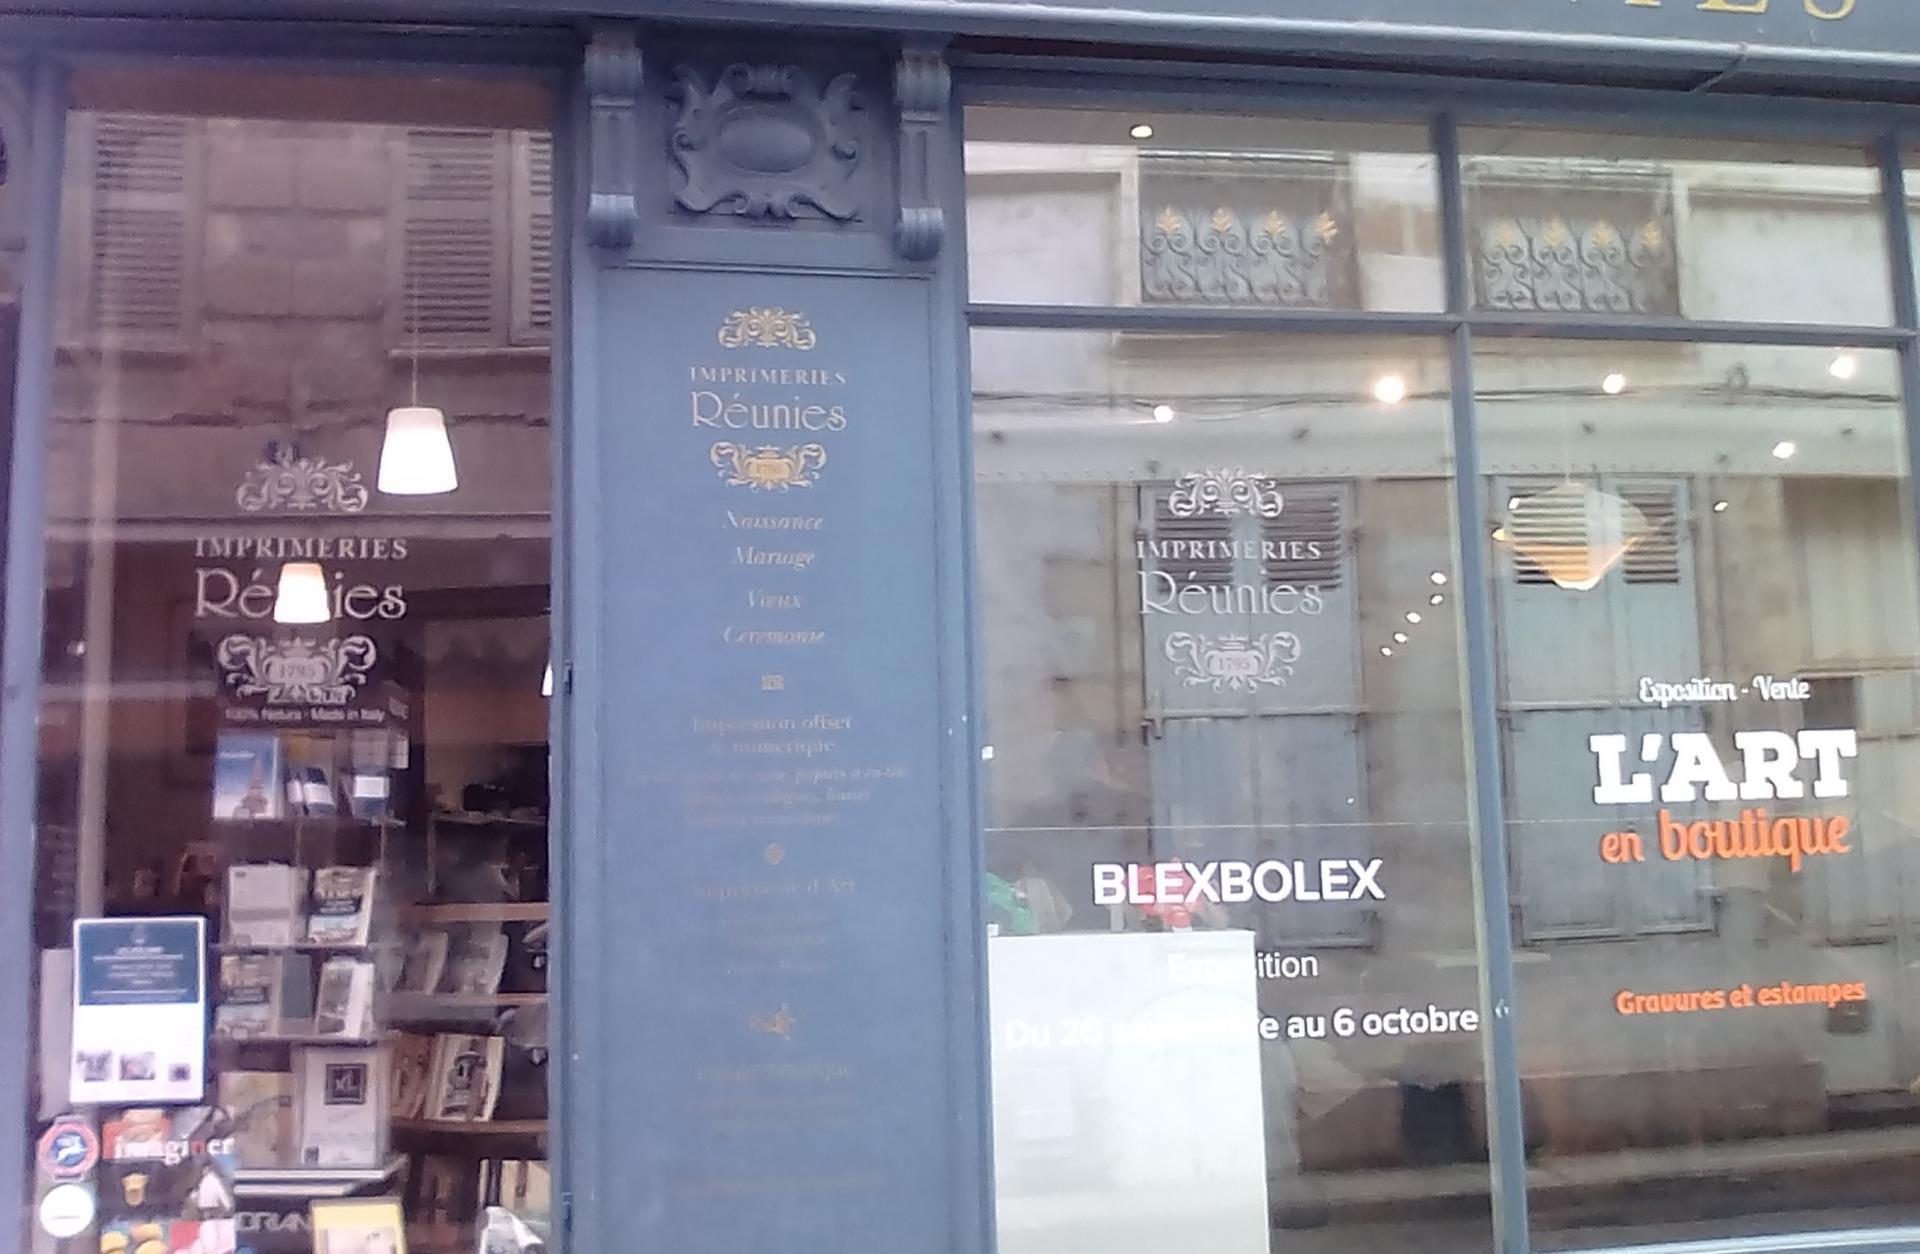 Librairie moulins expo blexbolex